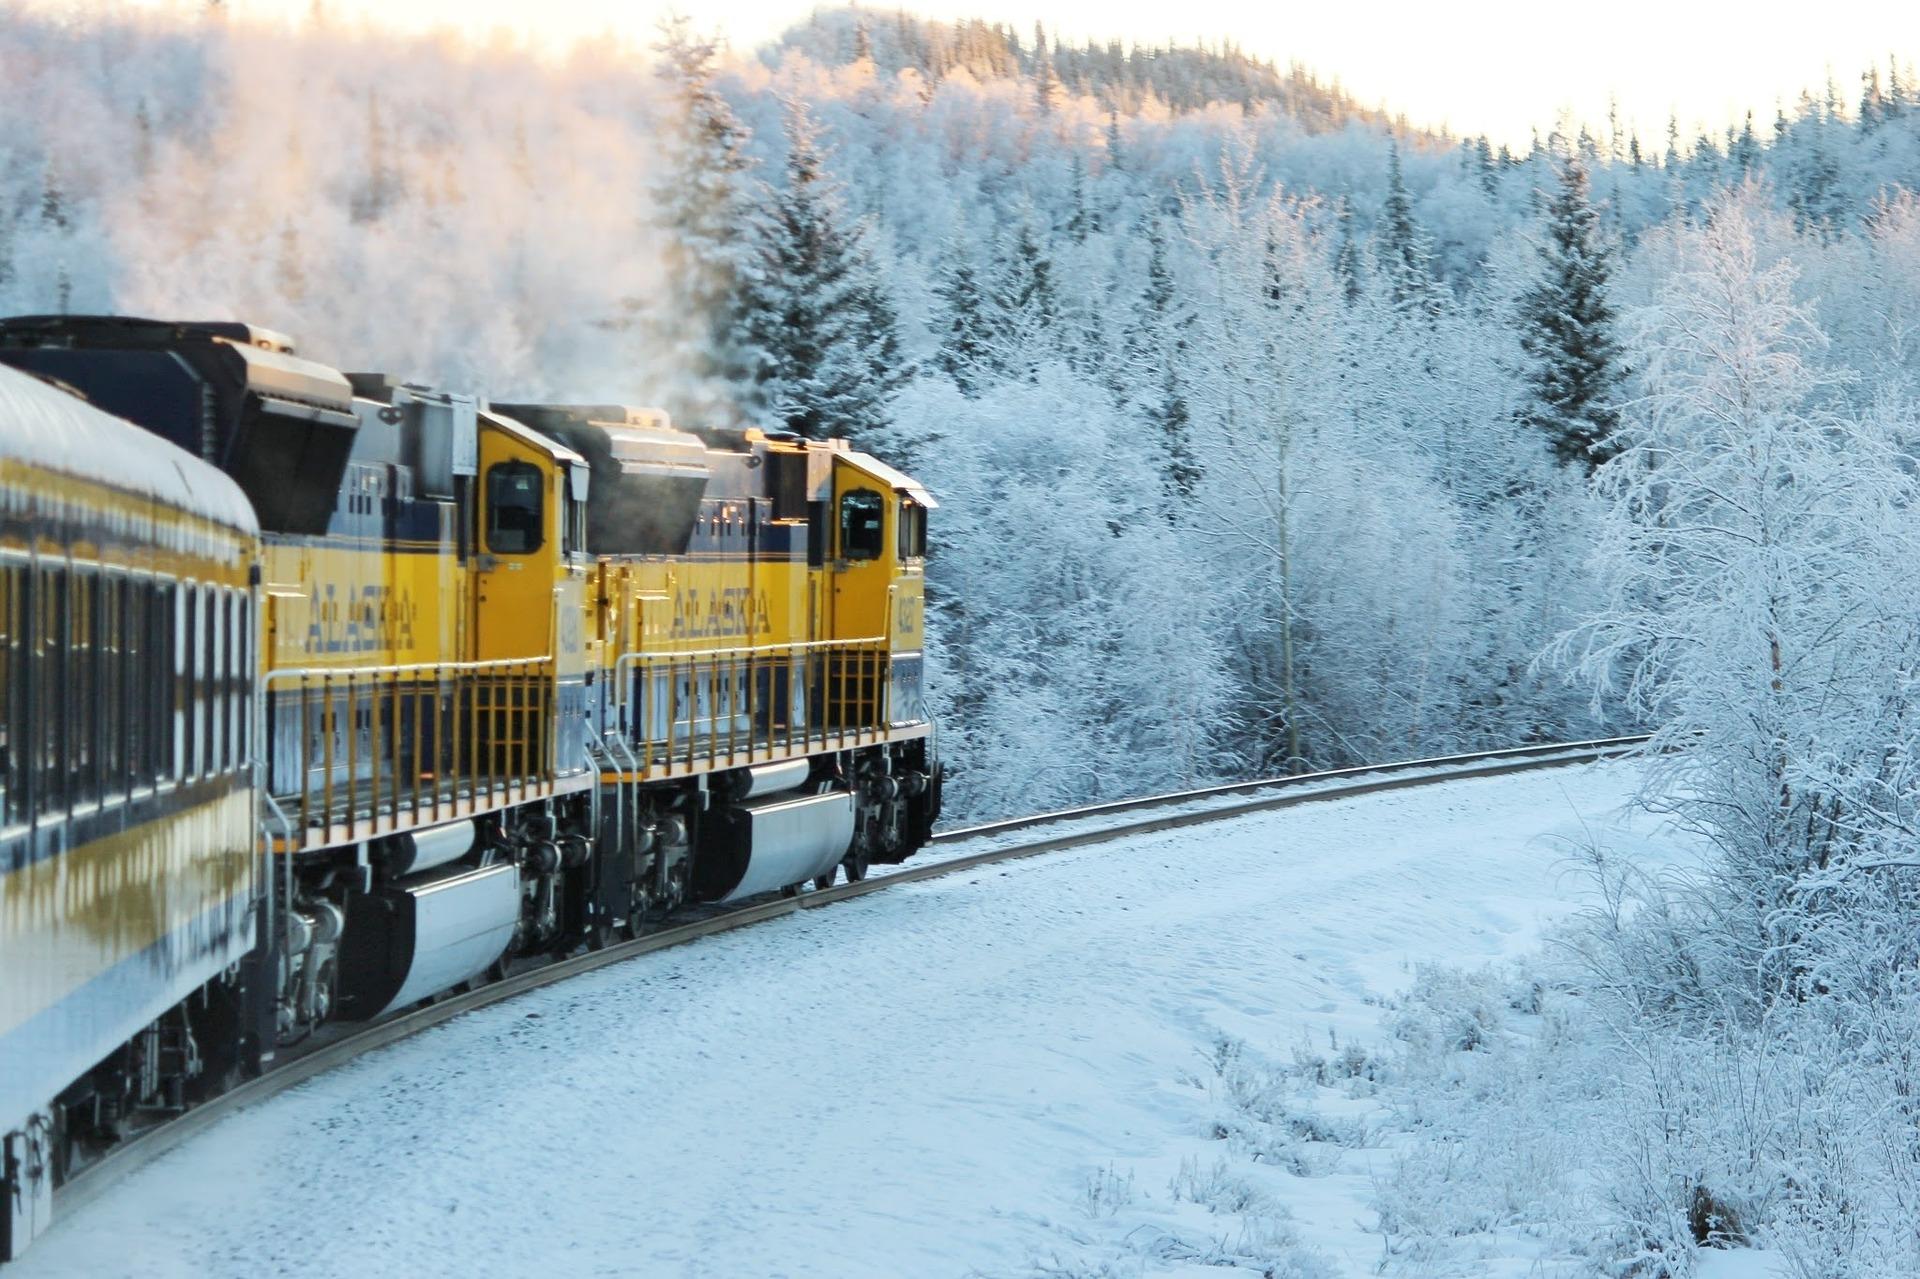 train-668964_1920 (1).jpg